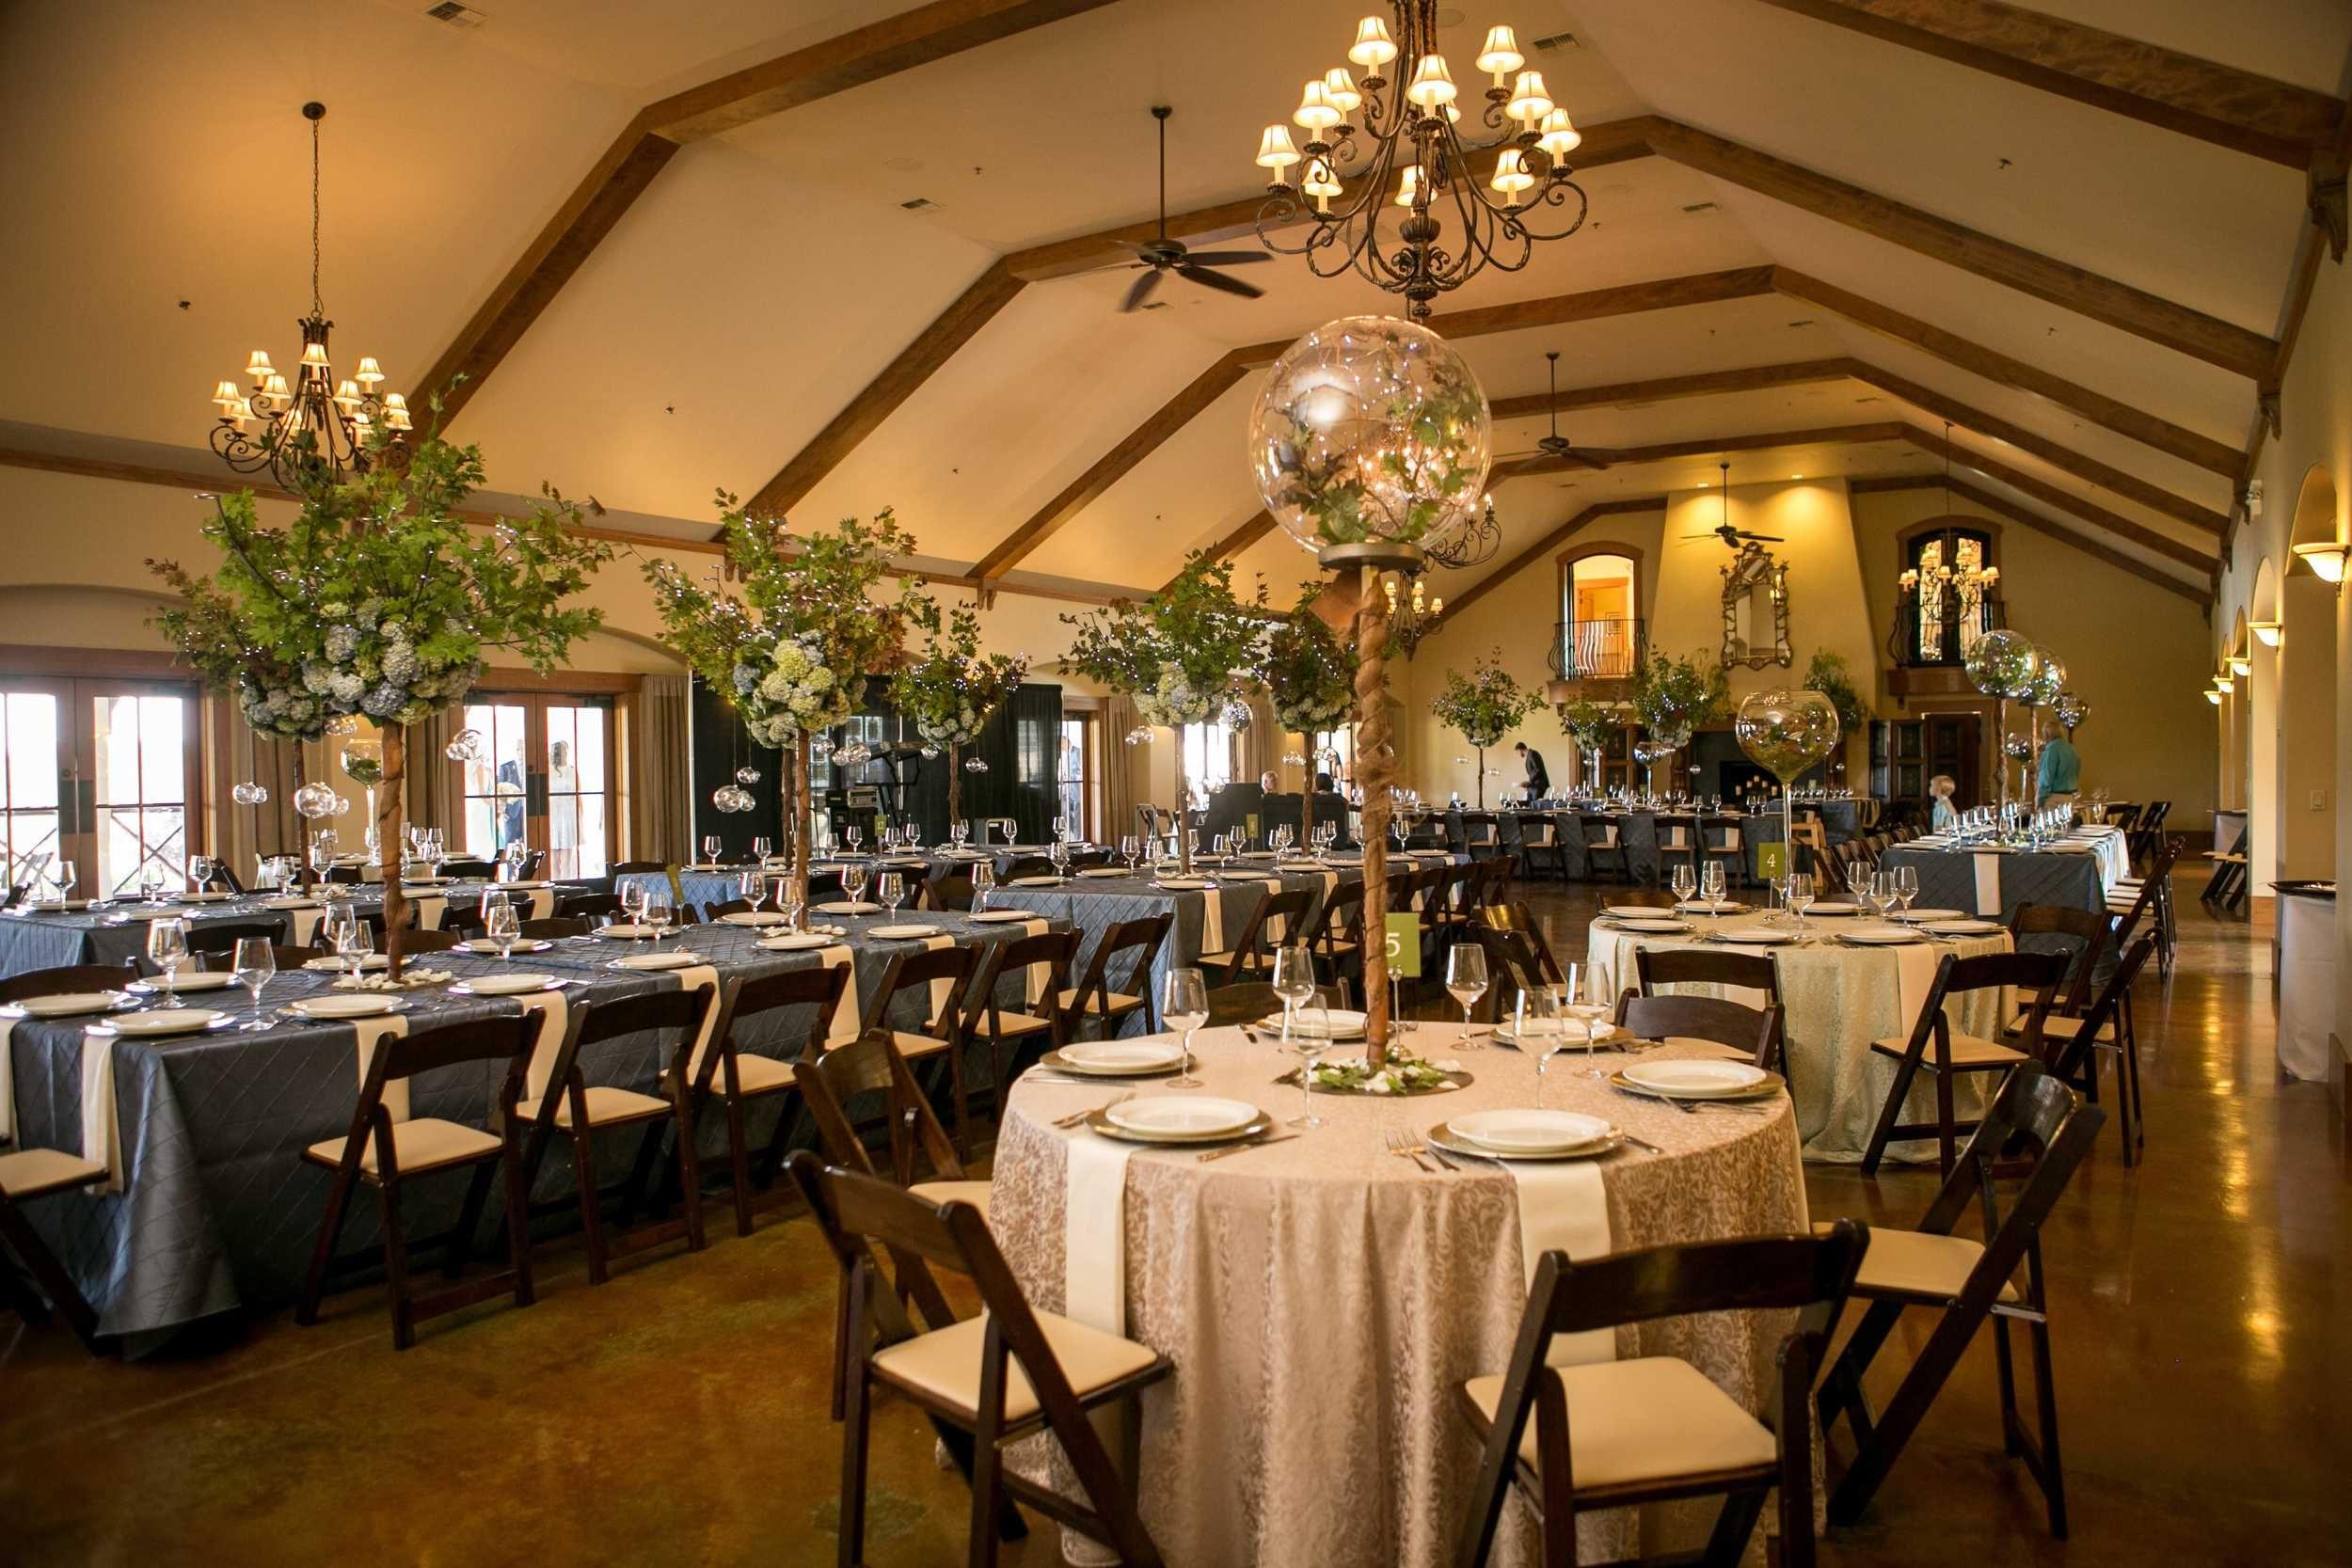 Zenith vineyards Oregon wedding venue ideas Winery